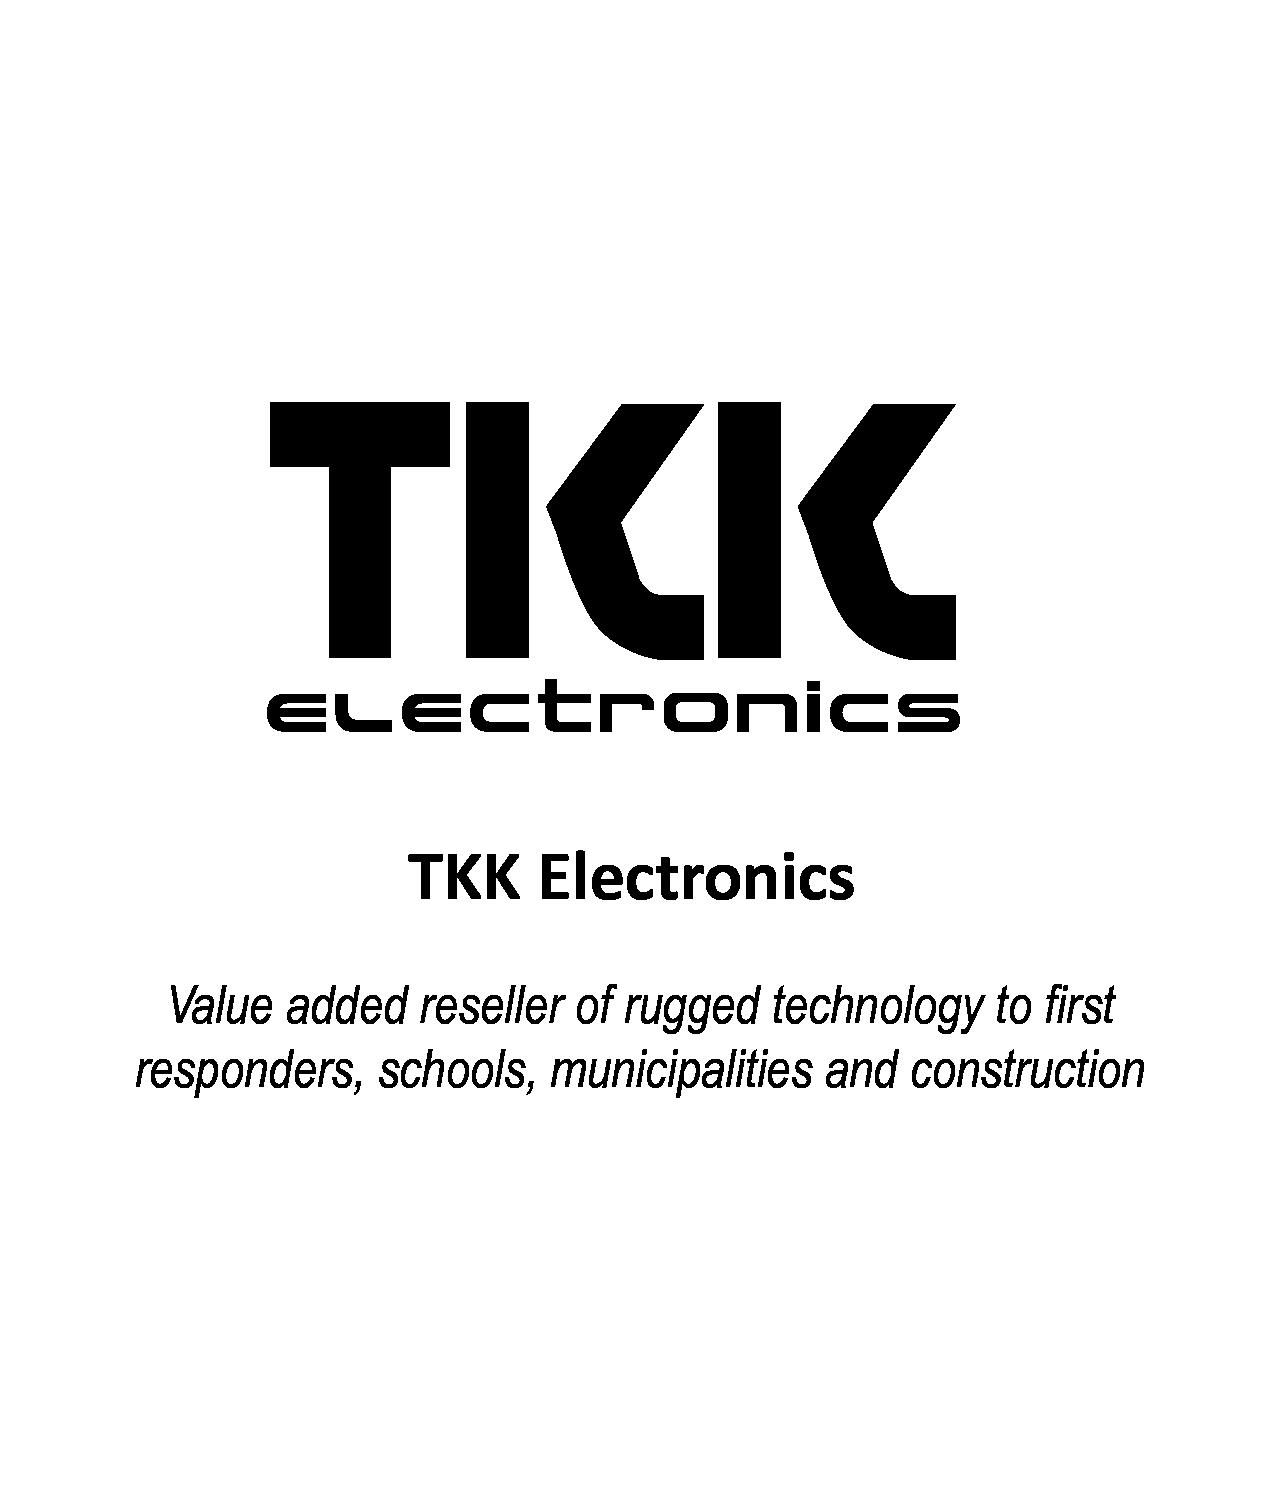 TKK Electronics